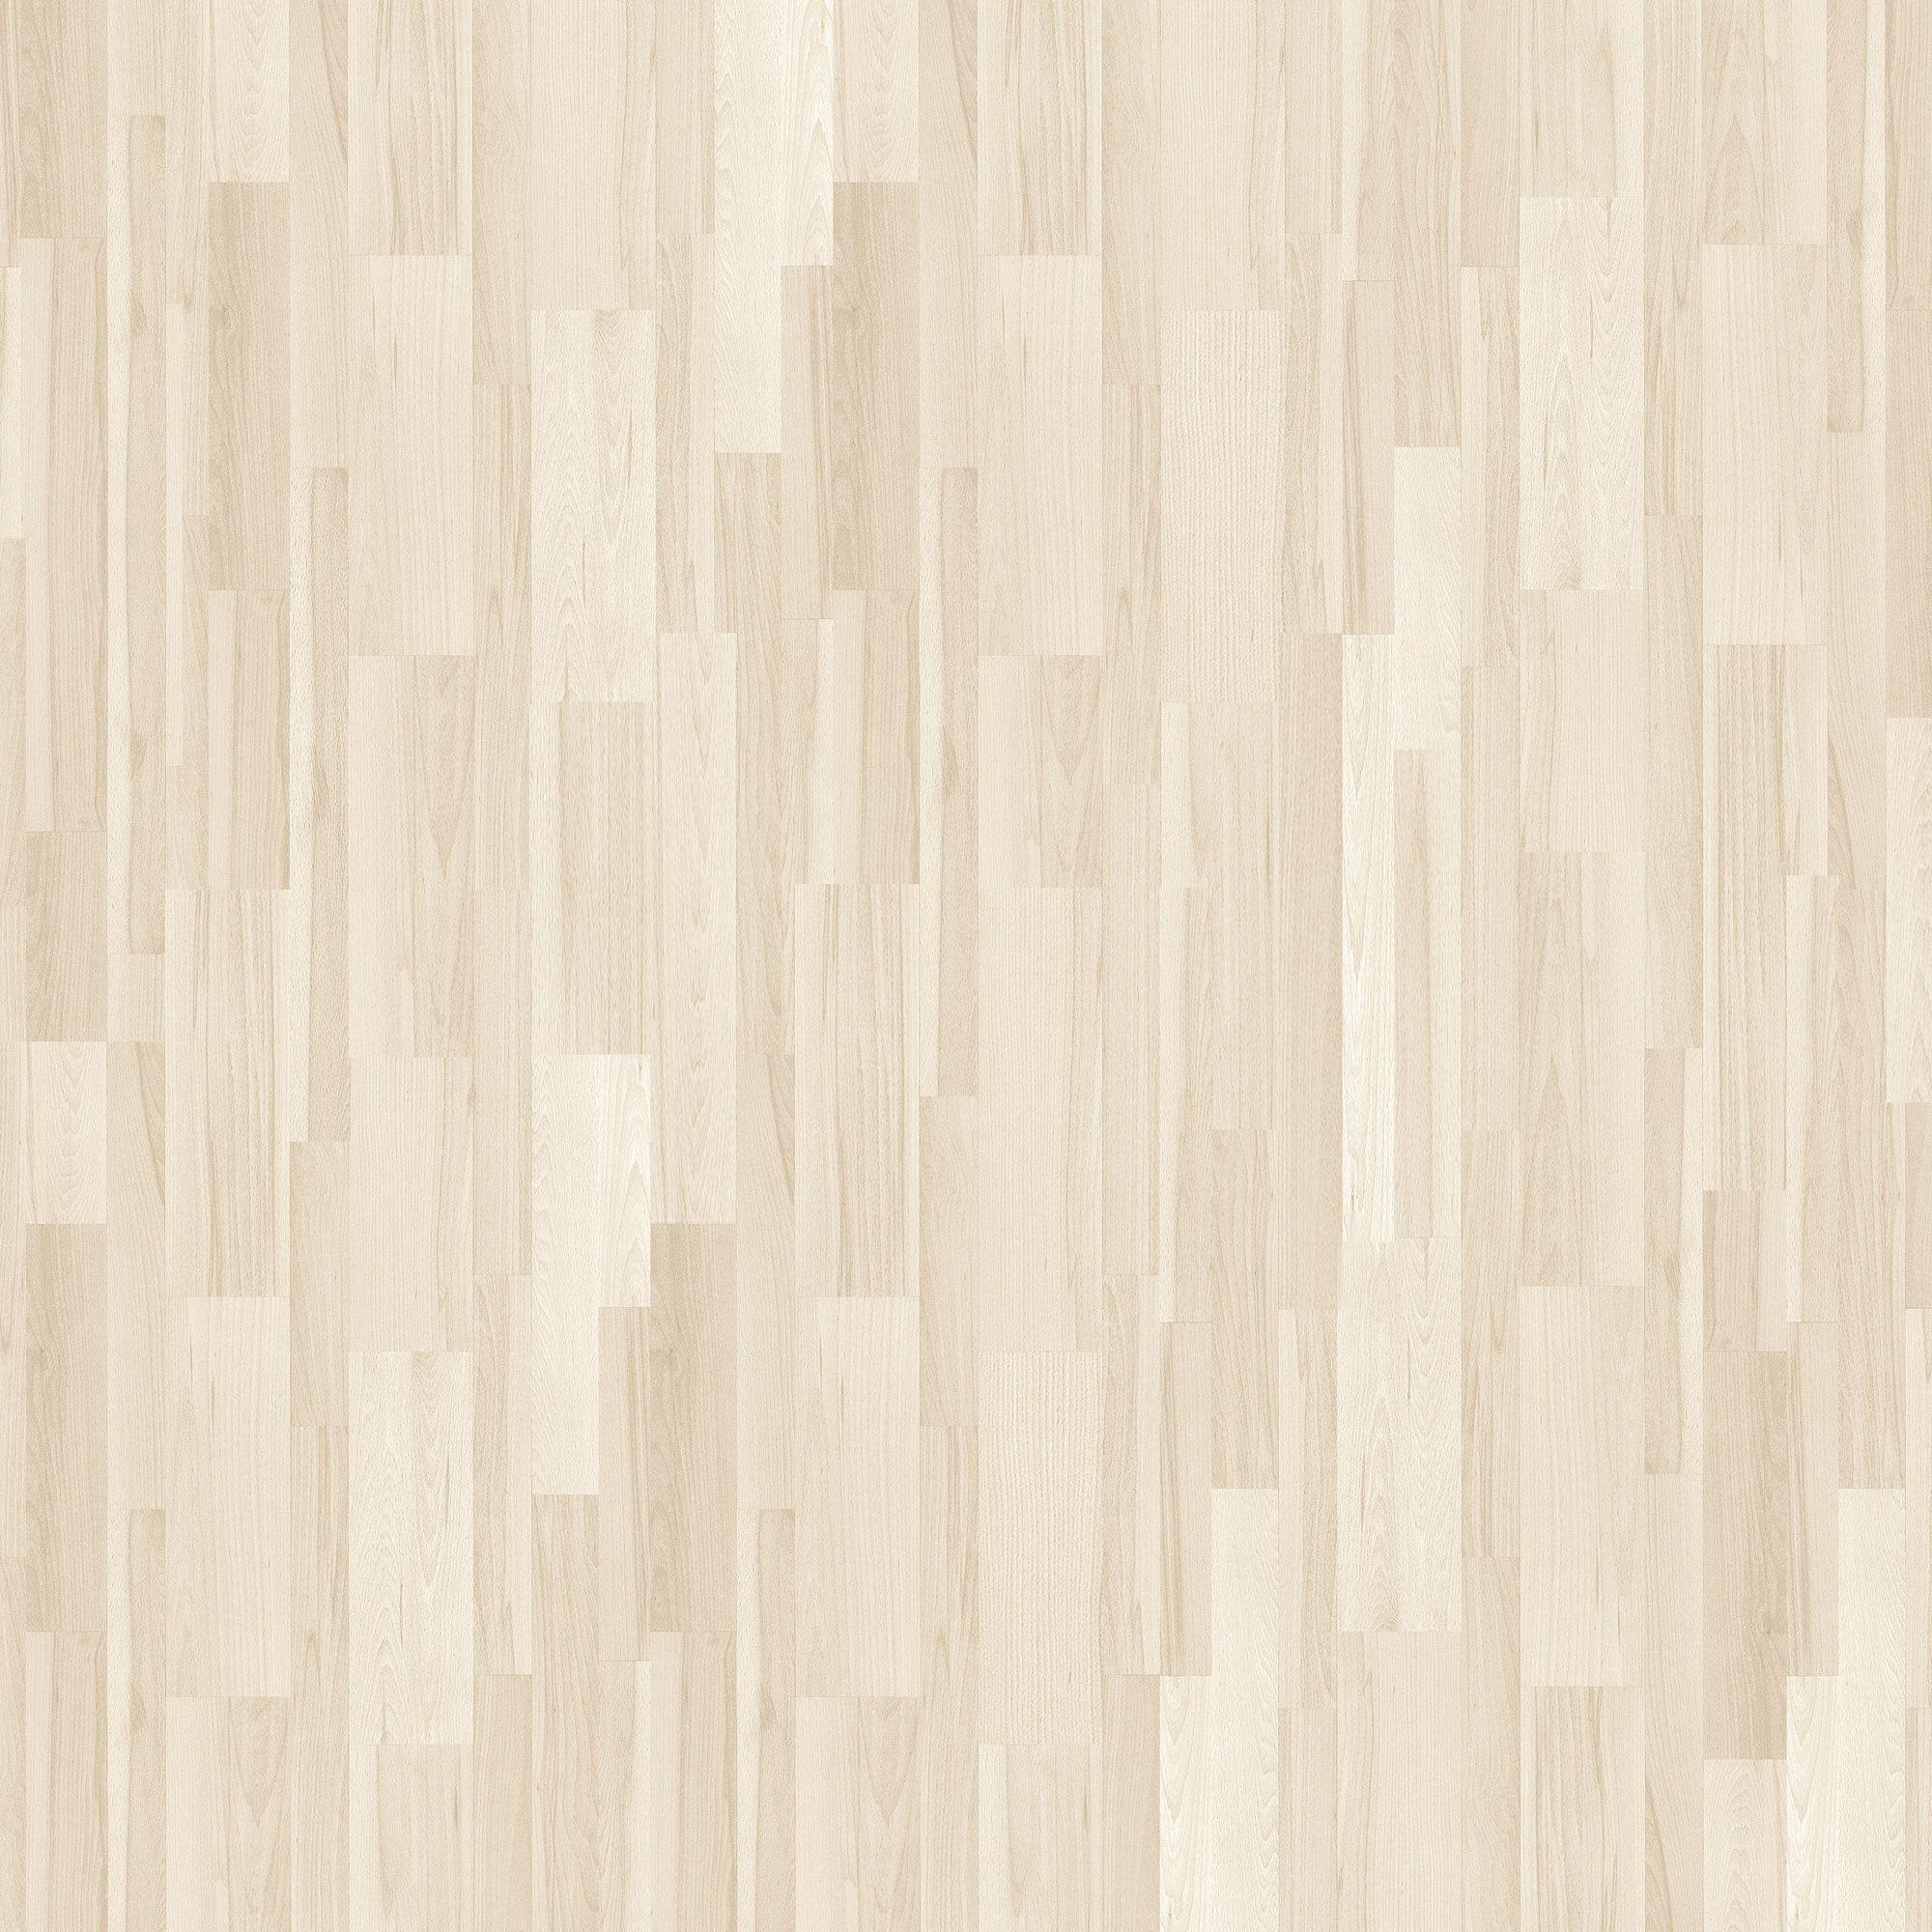 Light Hardwood Floors Off White Stone Flooring 2013 09 Wood Planks White Hardwood